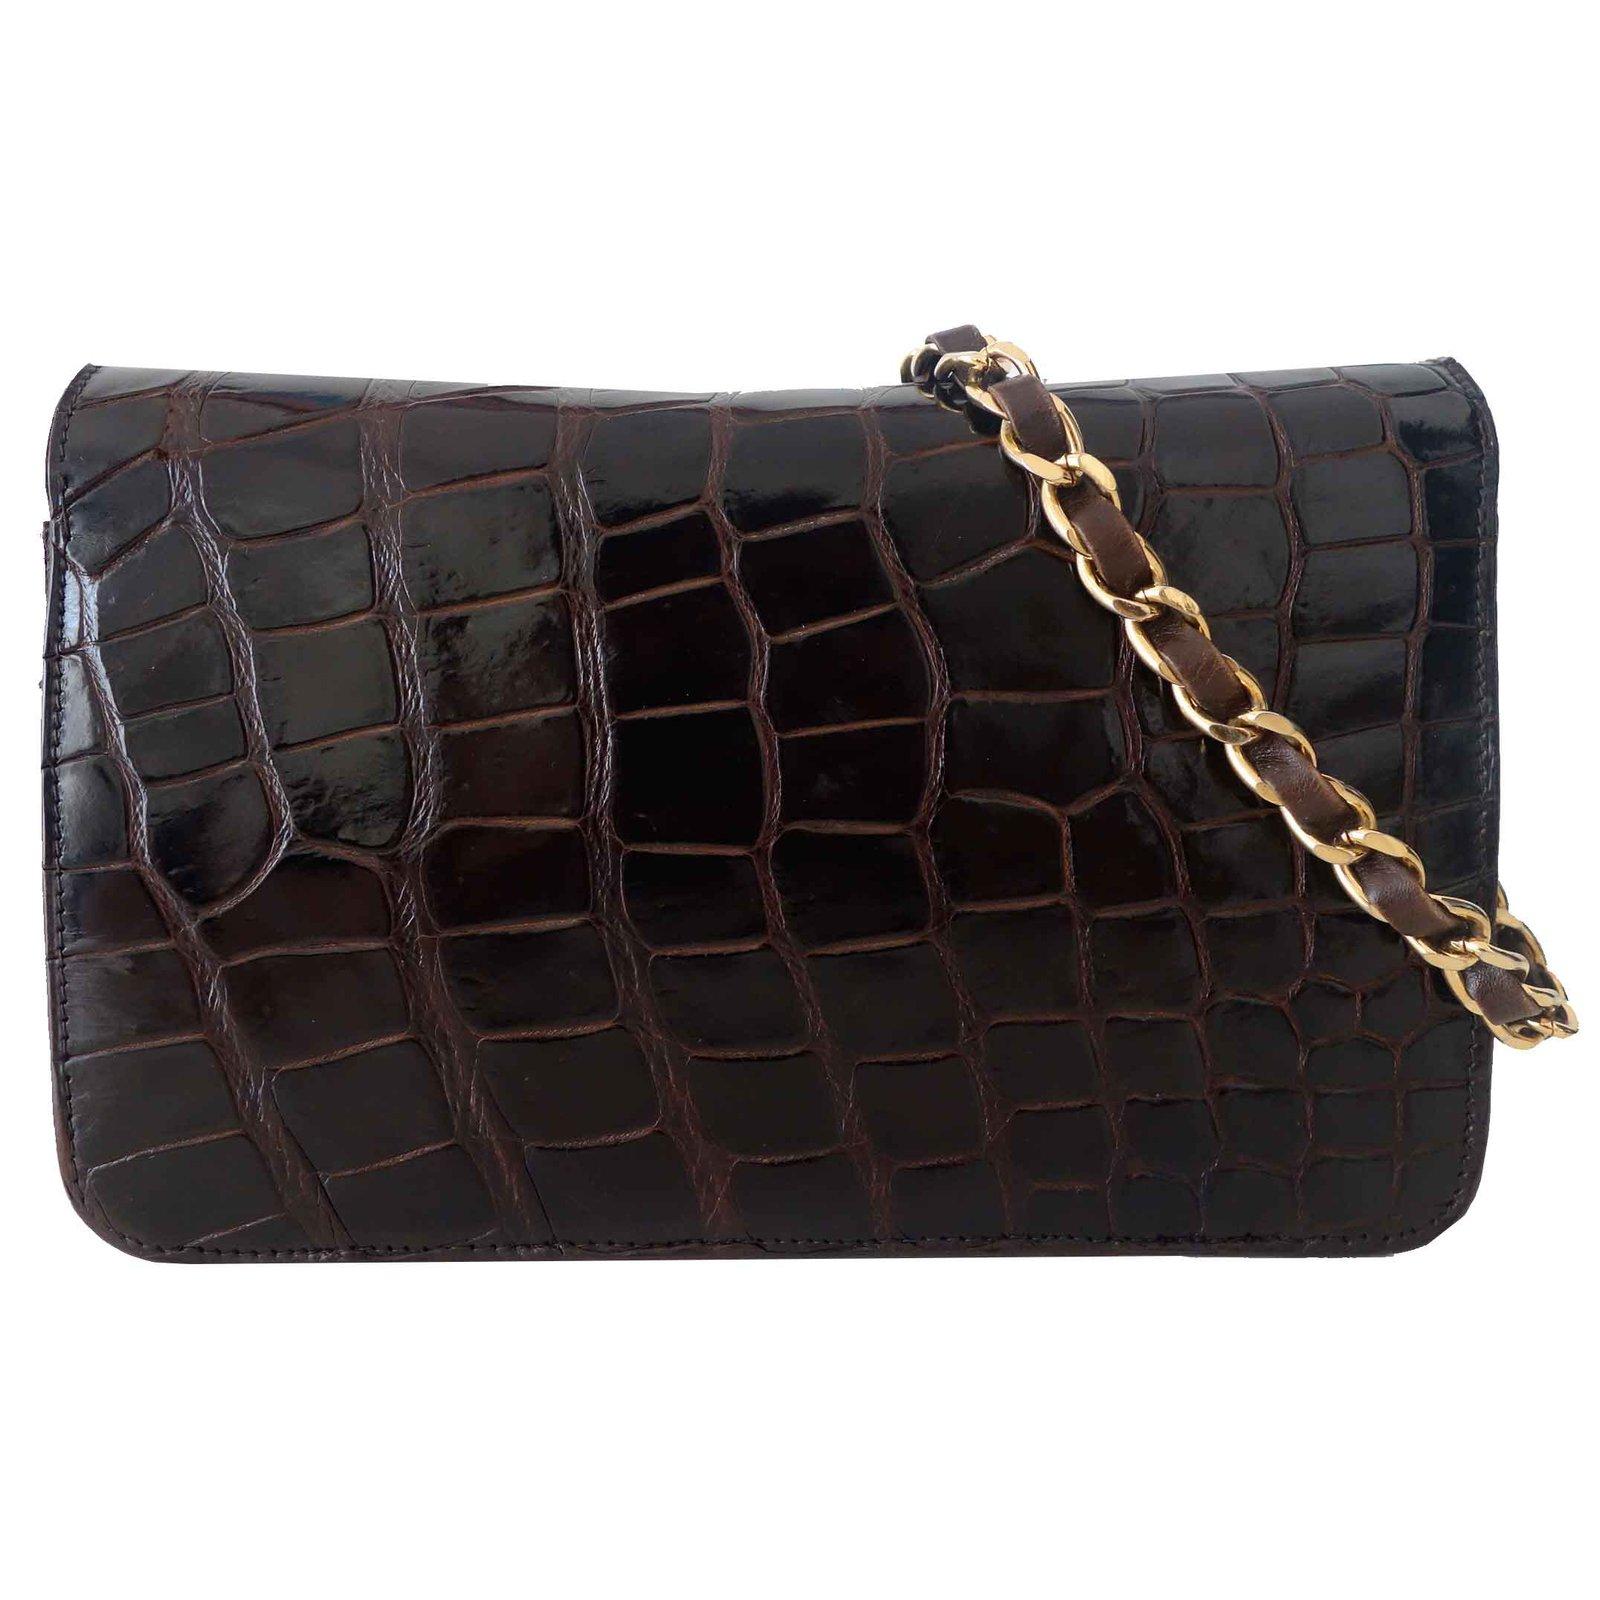 sacs main chanel sac vintage crocodile marron cuirs exotiques marron joli closet. Black Bedroom Furniture Sets. Home Design Ideas